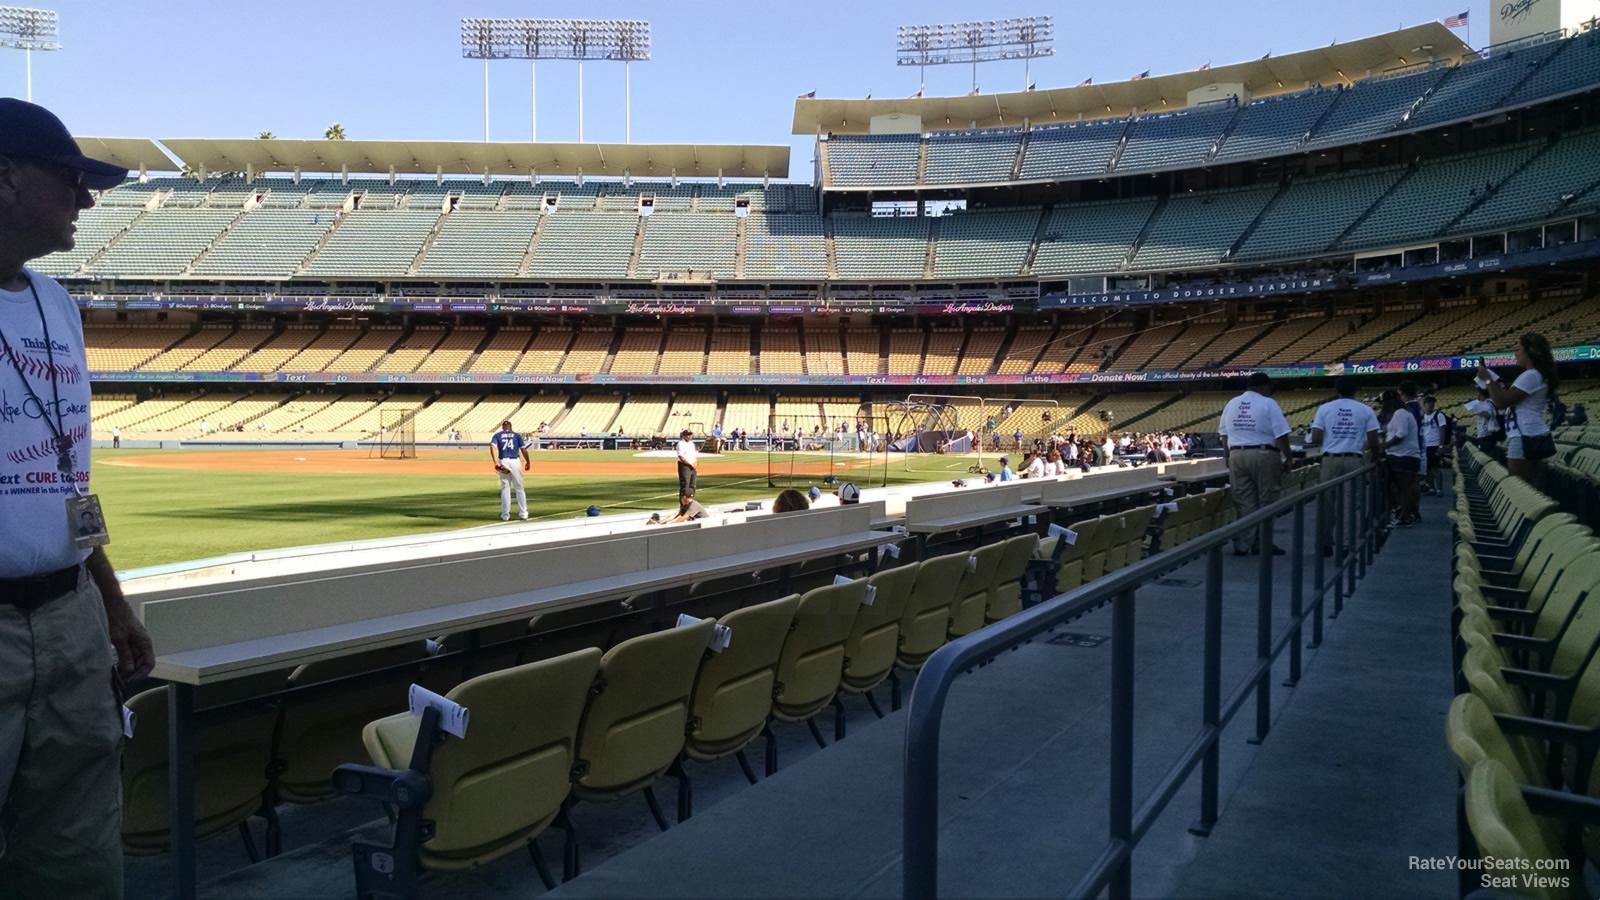 Dodger Stadium Section 45 - RateYourSeats.com